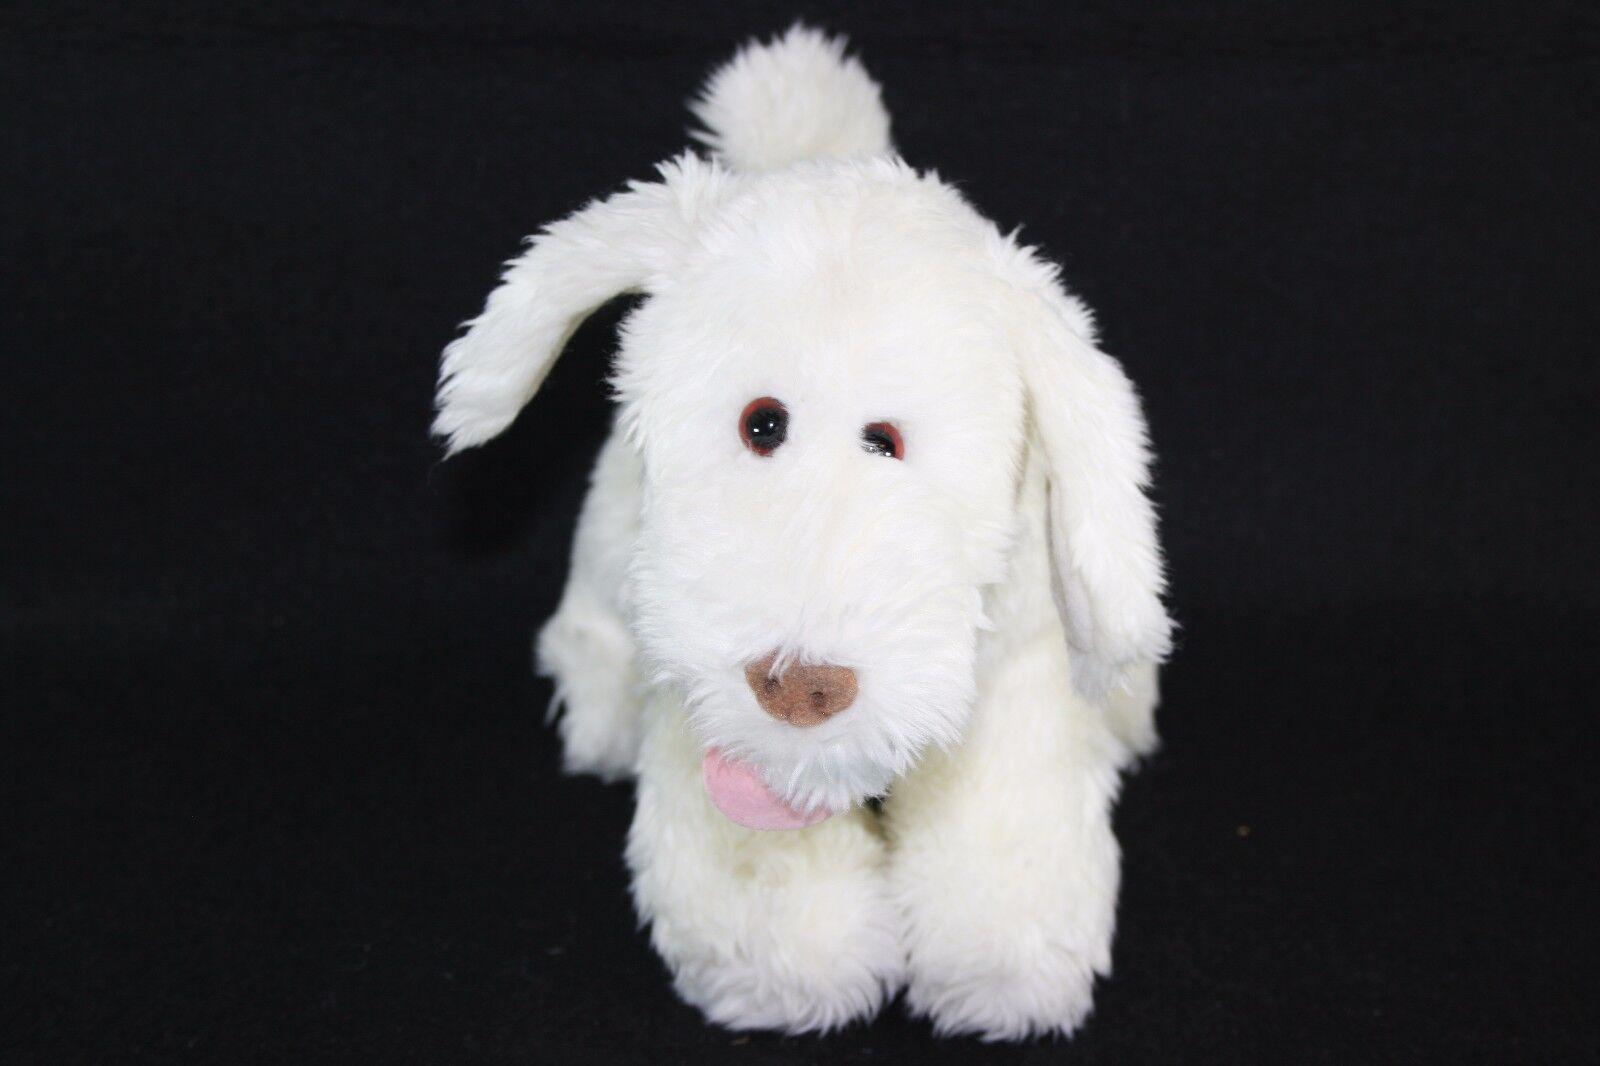 Target Gund  White Puppy Dog Stuffed Animal 12  Soft Plush